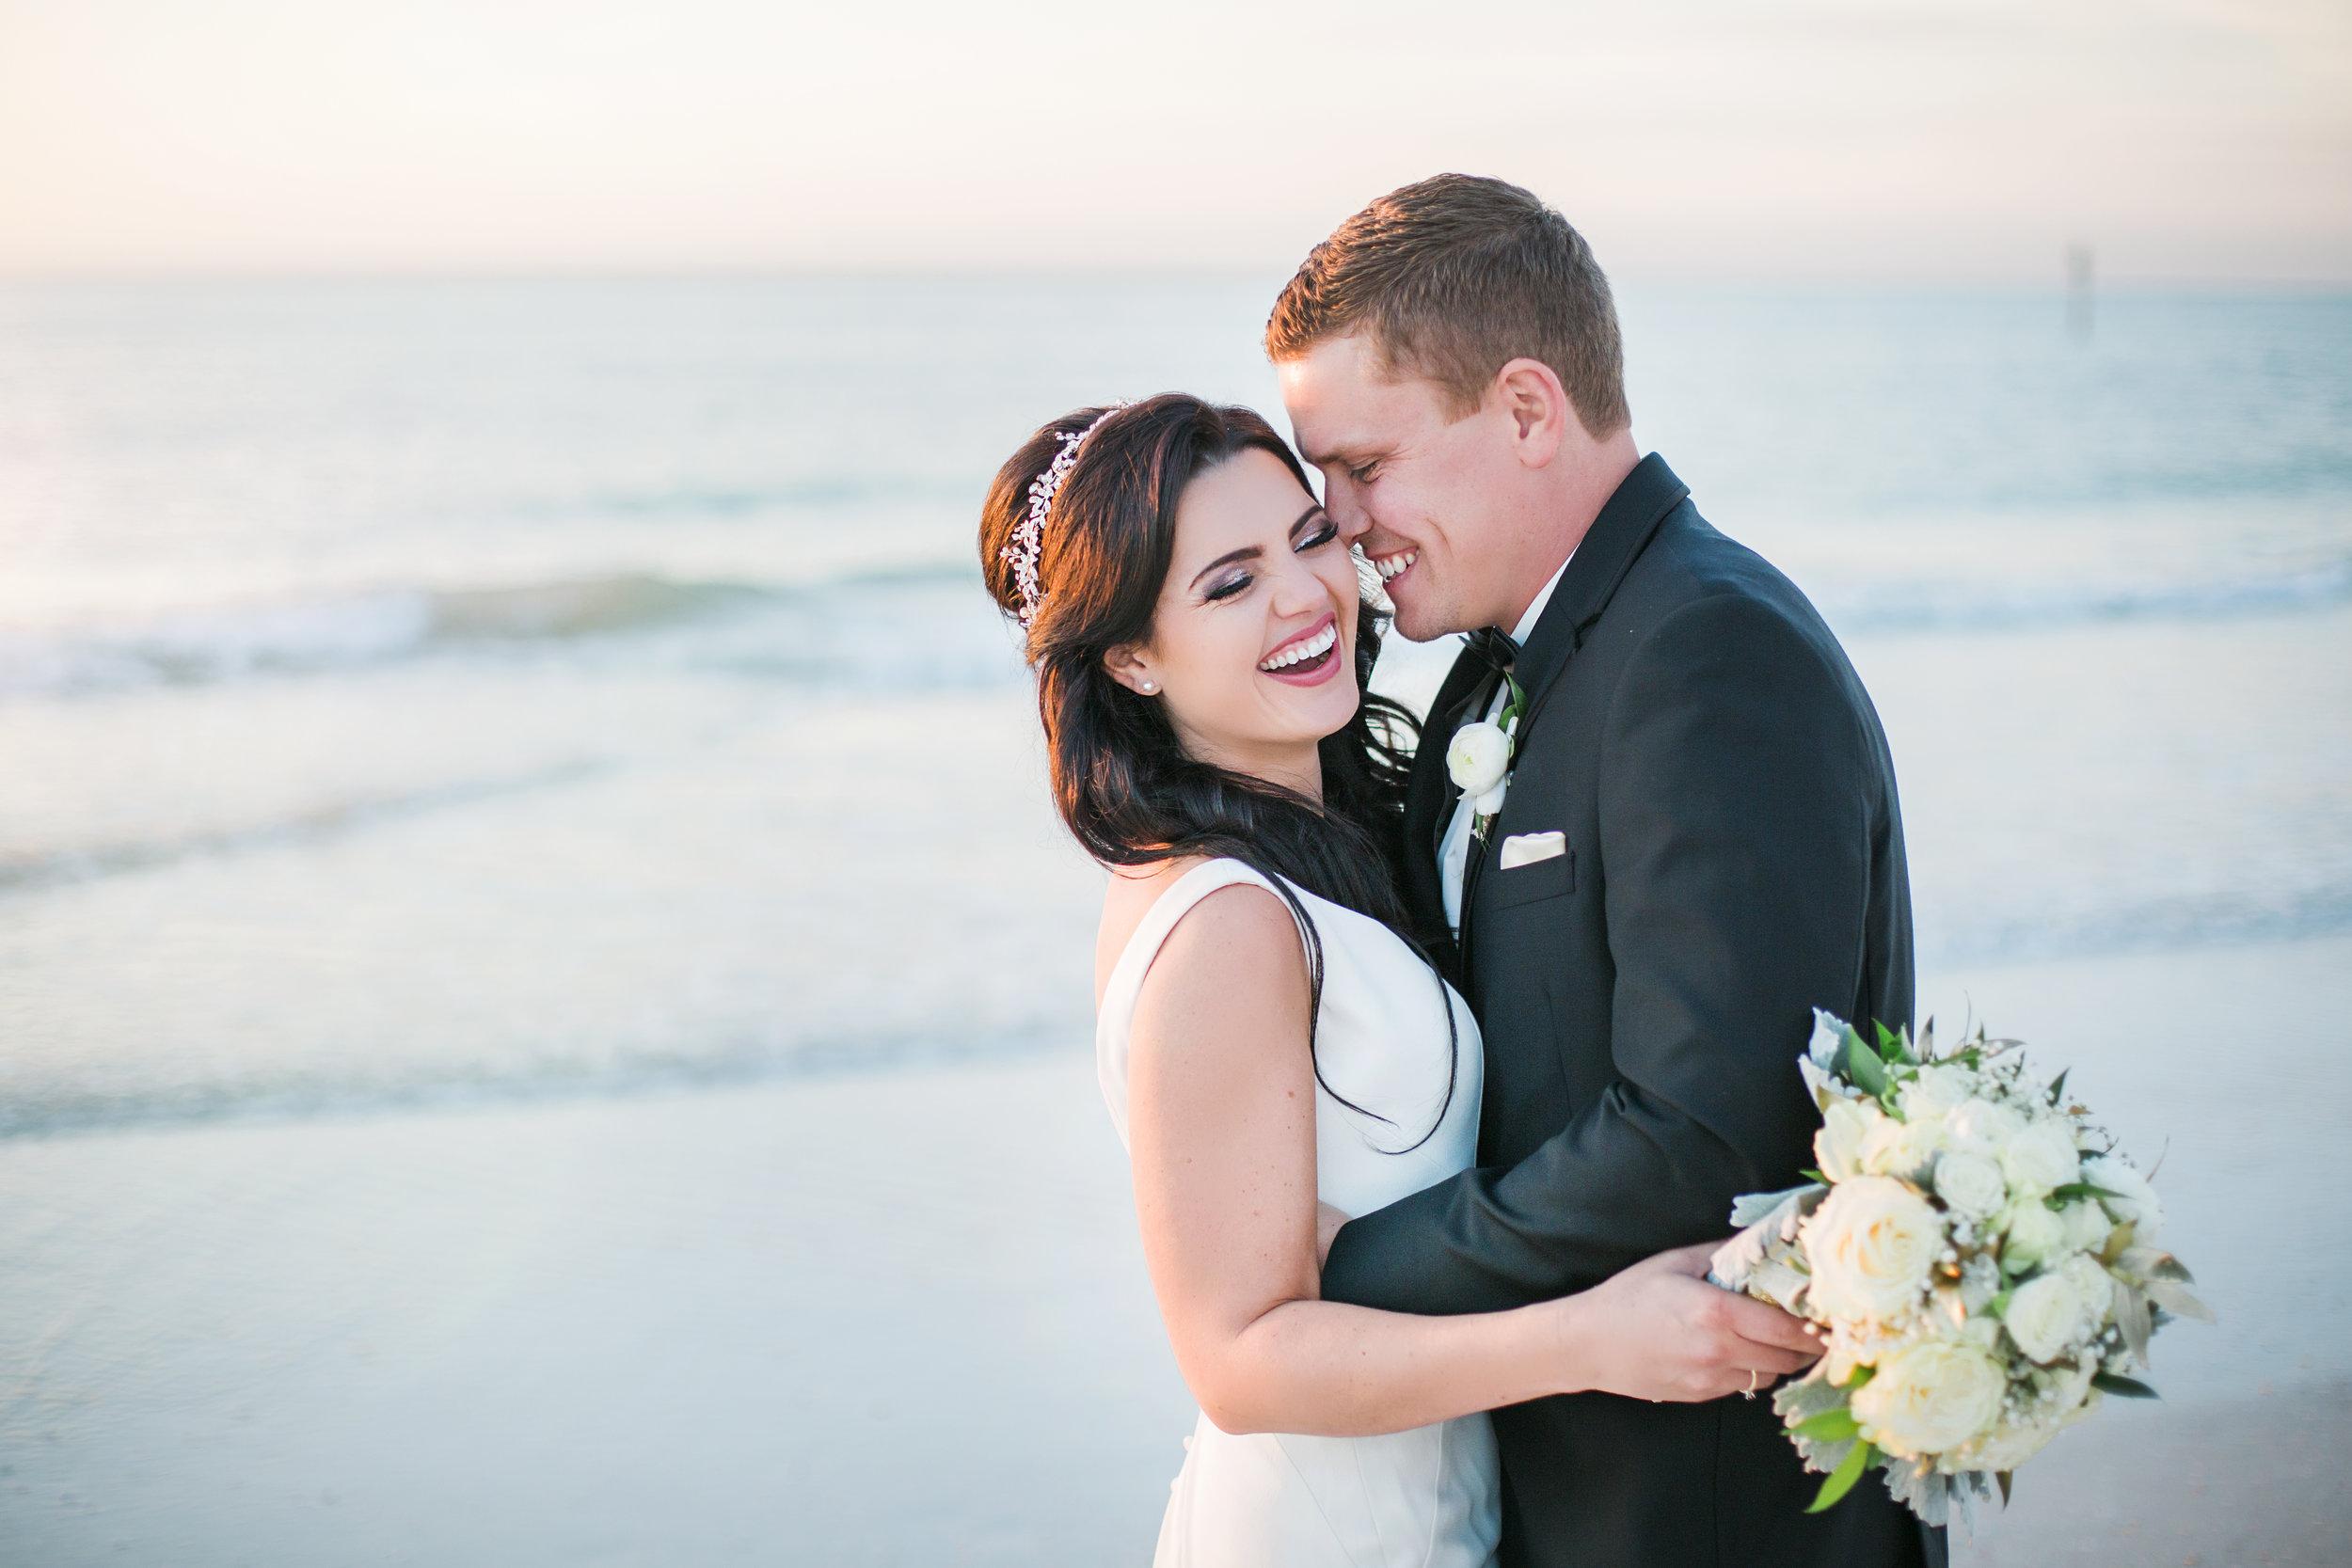 Emily & Co Wedding Photography - Destination Wedding Photography Team - Sarasota Wedding Photographer - Sarasota Wedding Photography